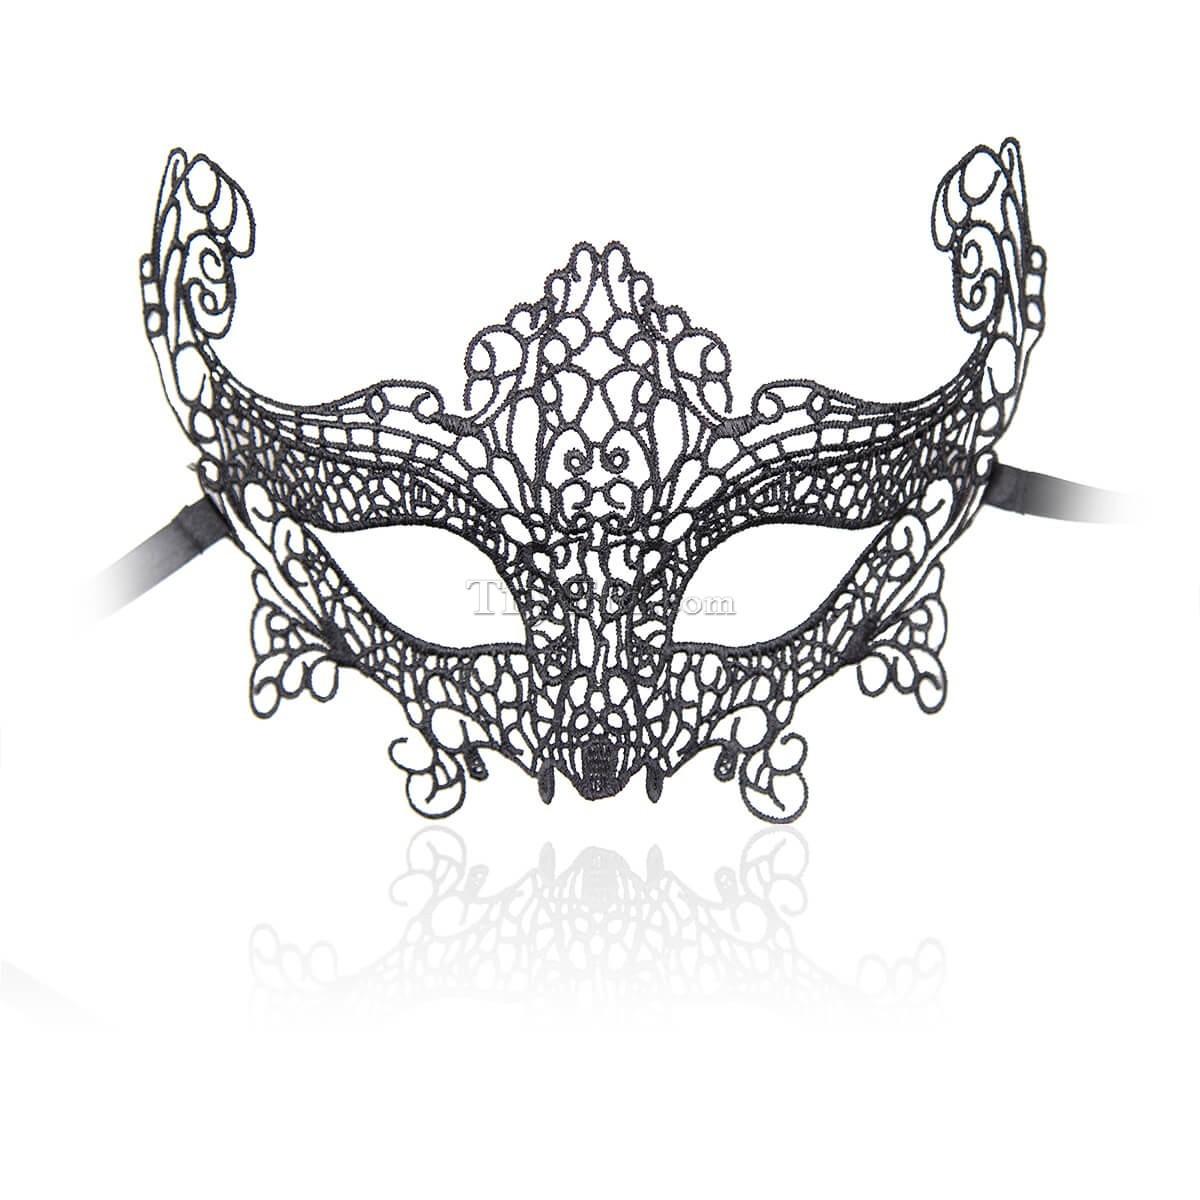 7-black-easy-eye-mask-style-32.jpg